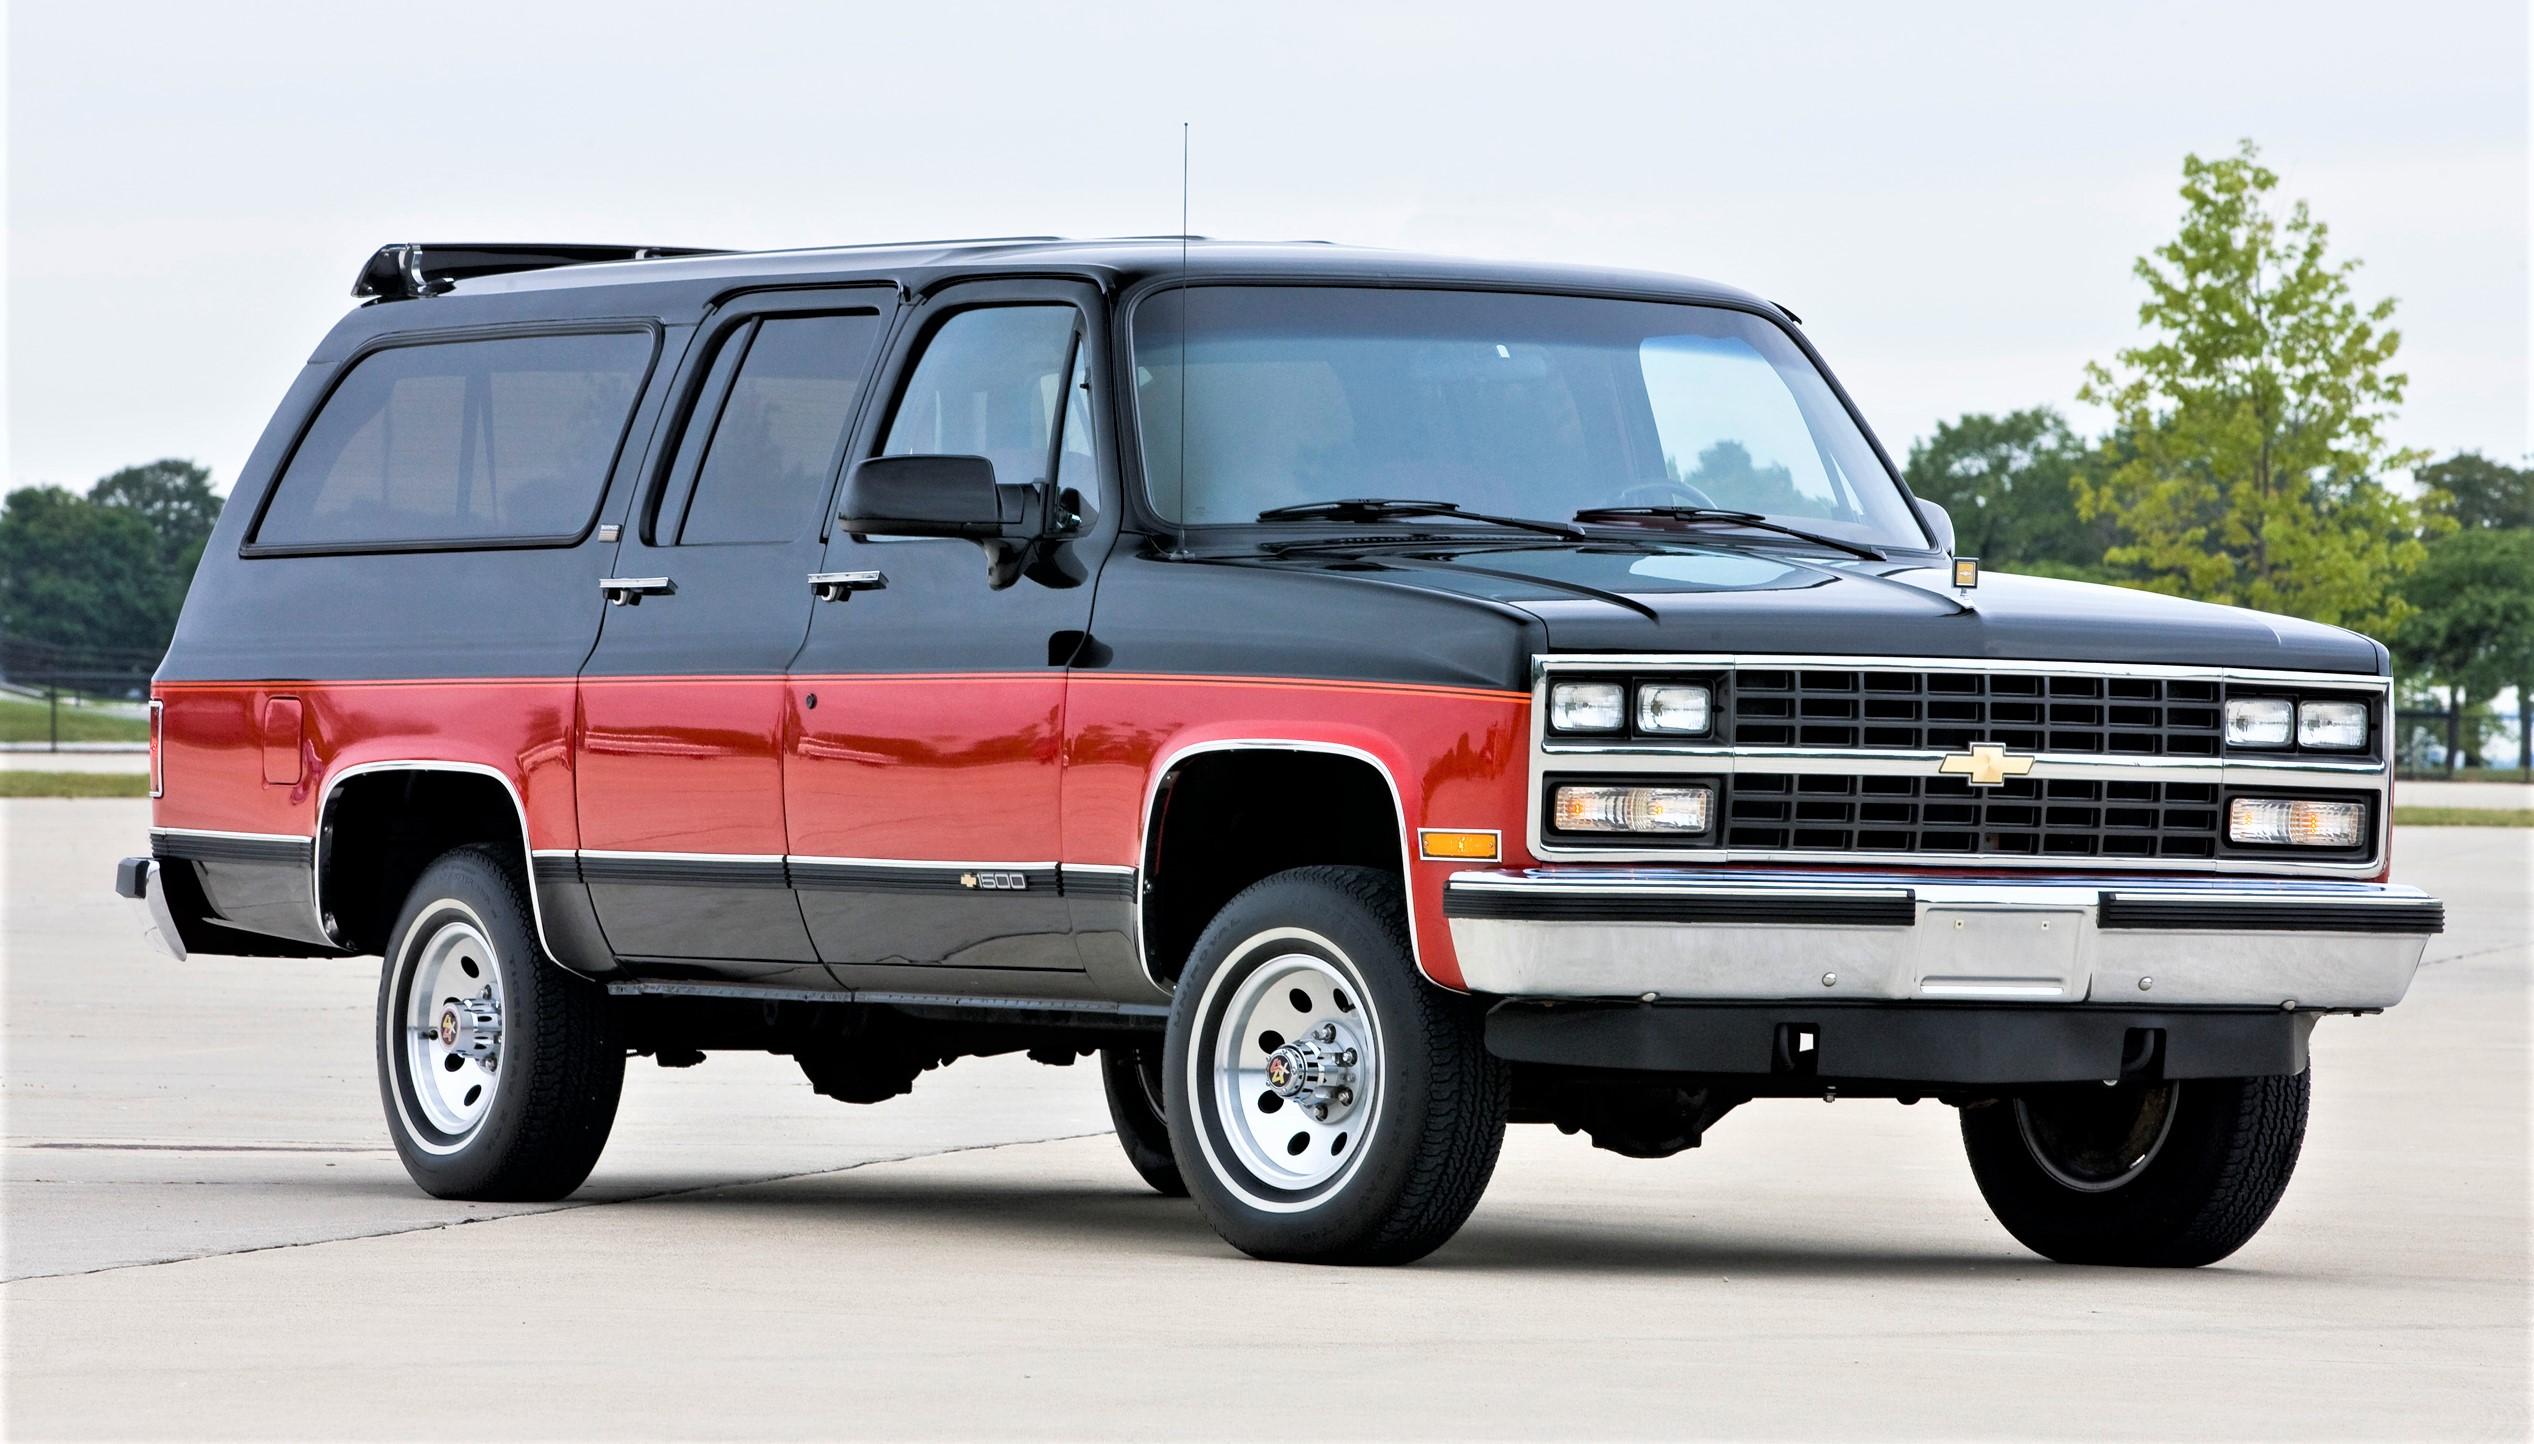 suburban, Chevrolet Suburban, longest-running nameplate, marks its 85th anniversary, ClassicCars.com Journal